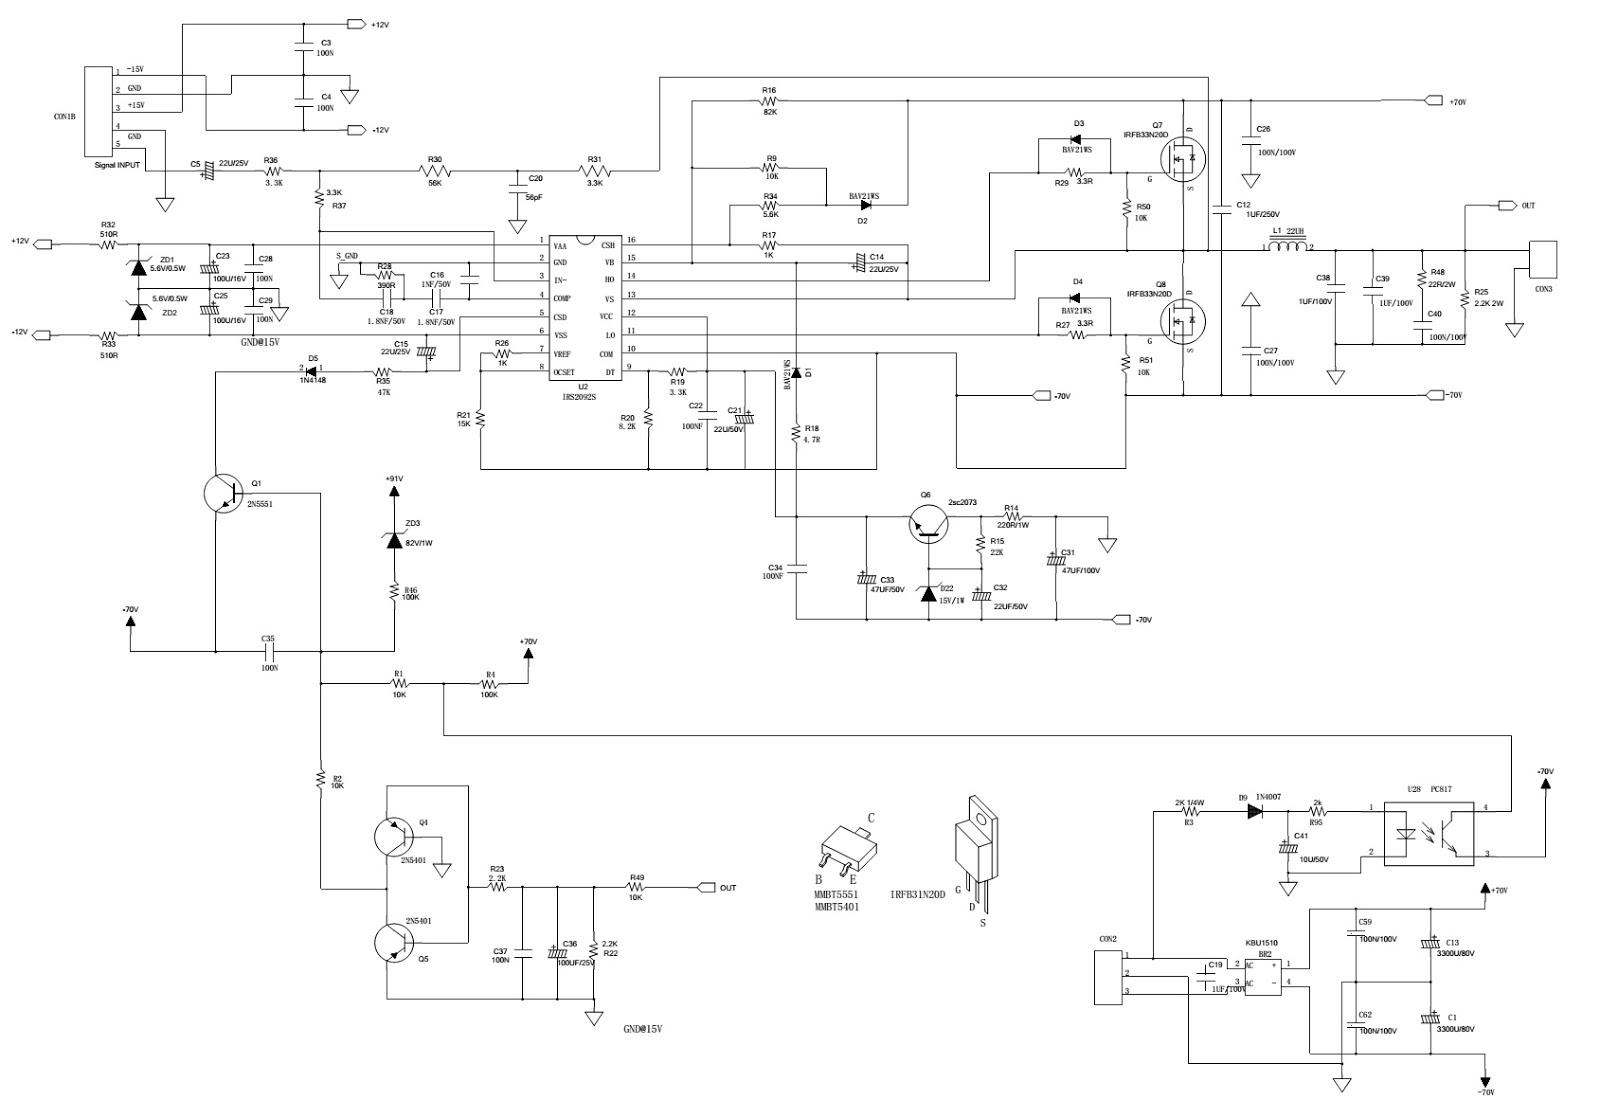 Circuit diagram of class d lifier fig 1 circuit diagram of class d lifierhtml opel astra wiring diagram blueraritaninfo